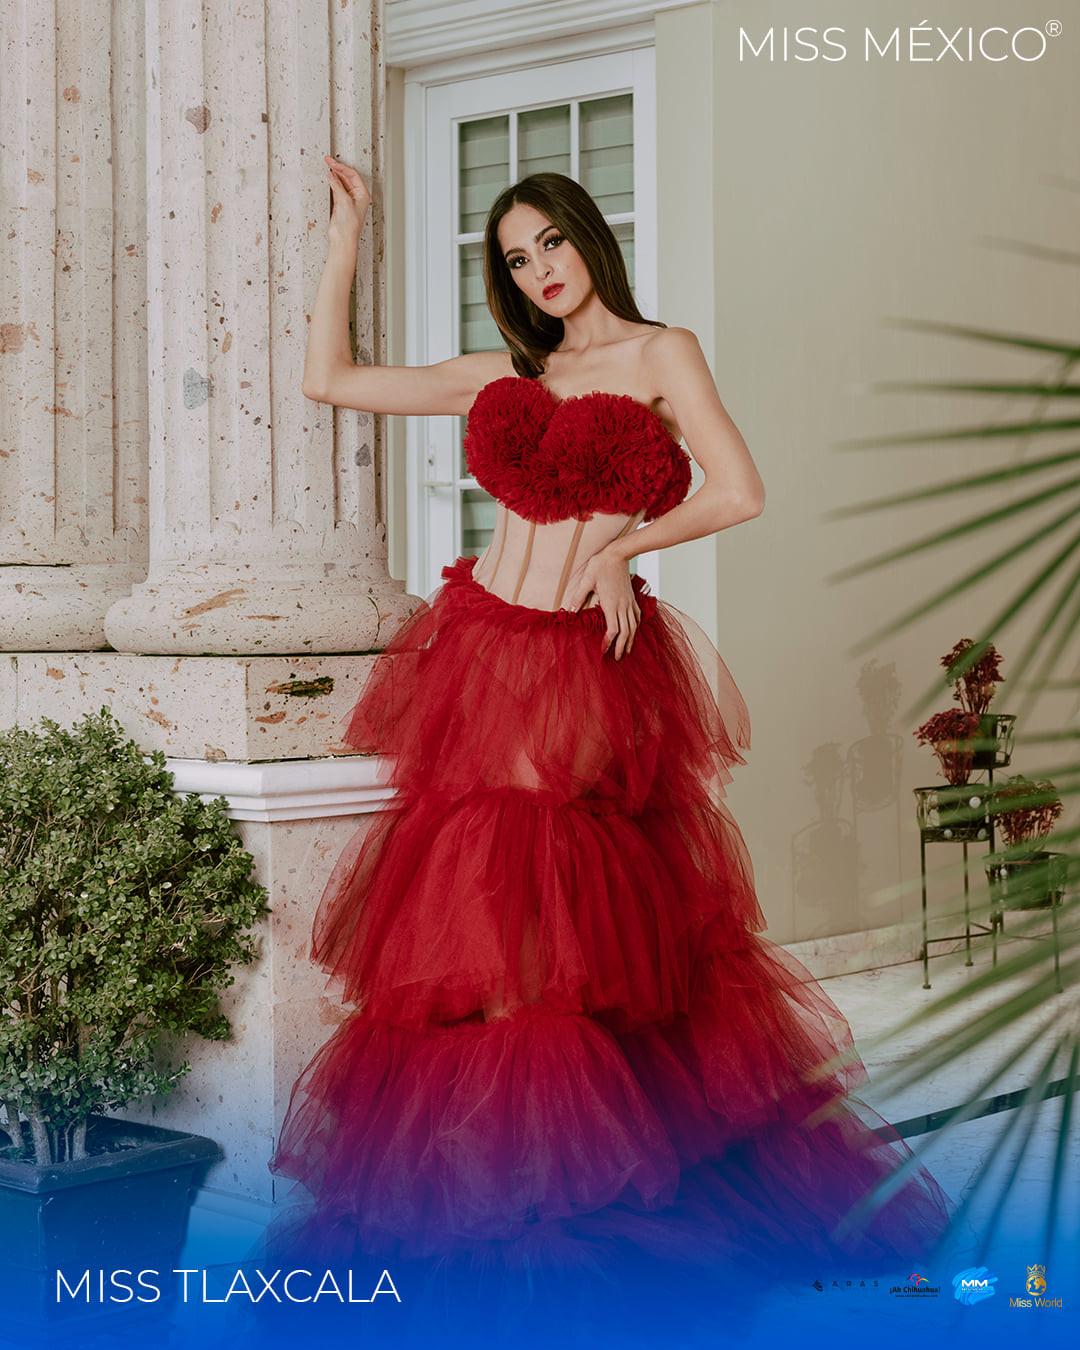 candidatas a miss mexico 2021, final: 3 july. - Página 13 Bm7PO7